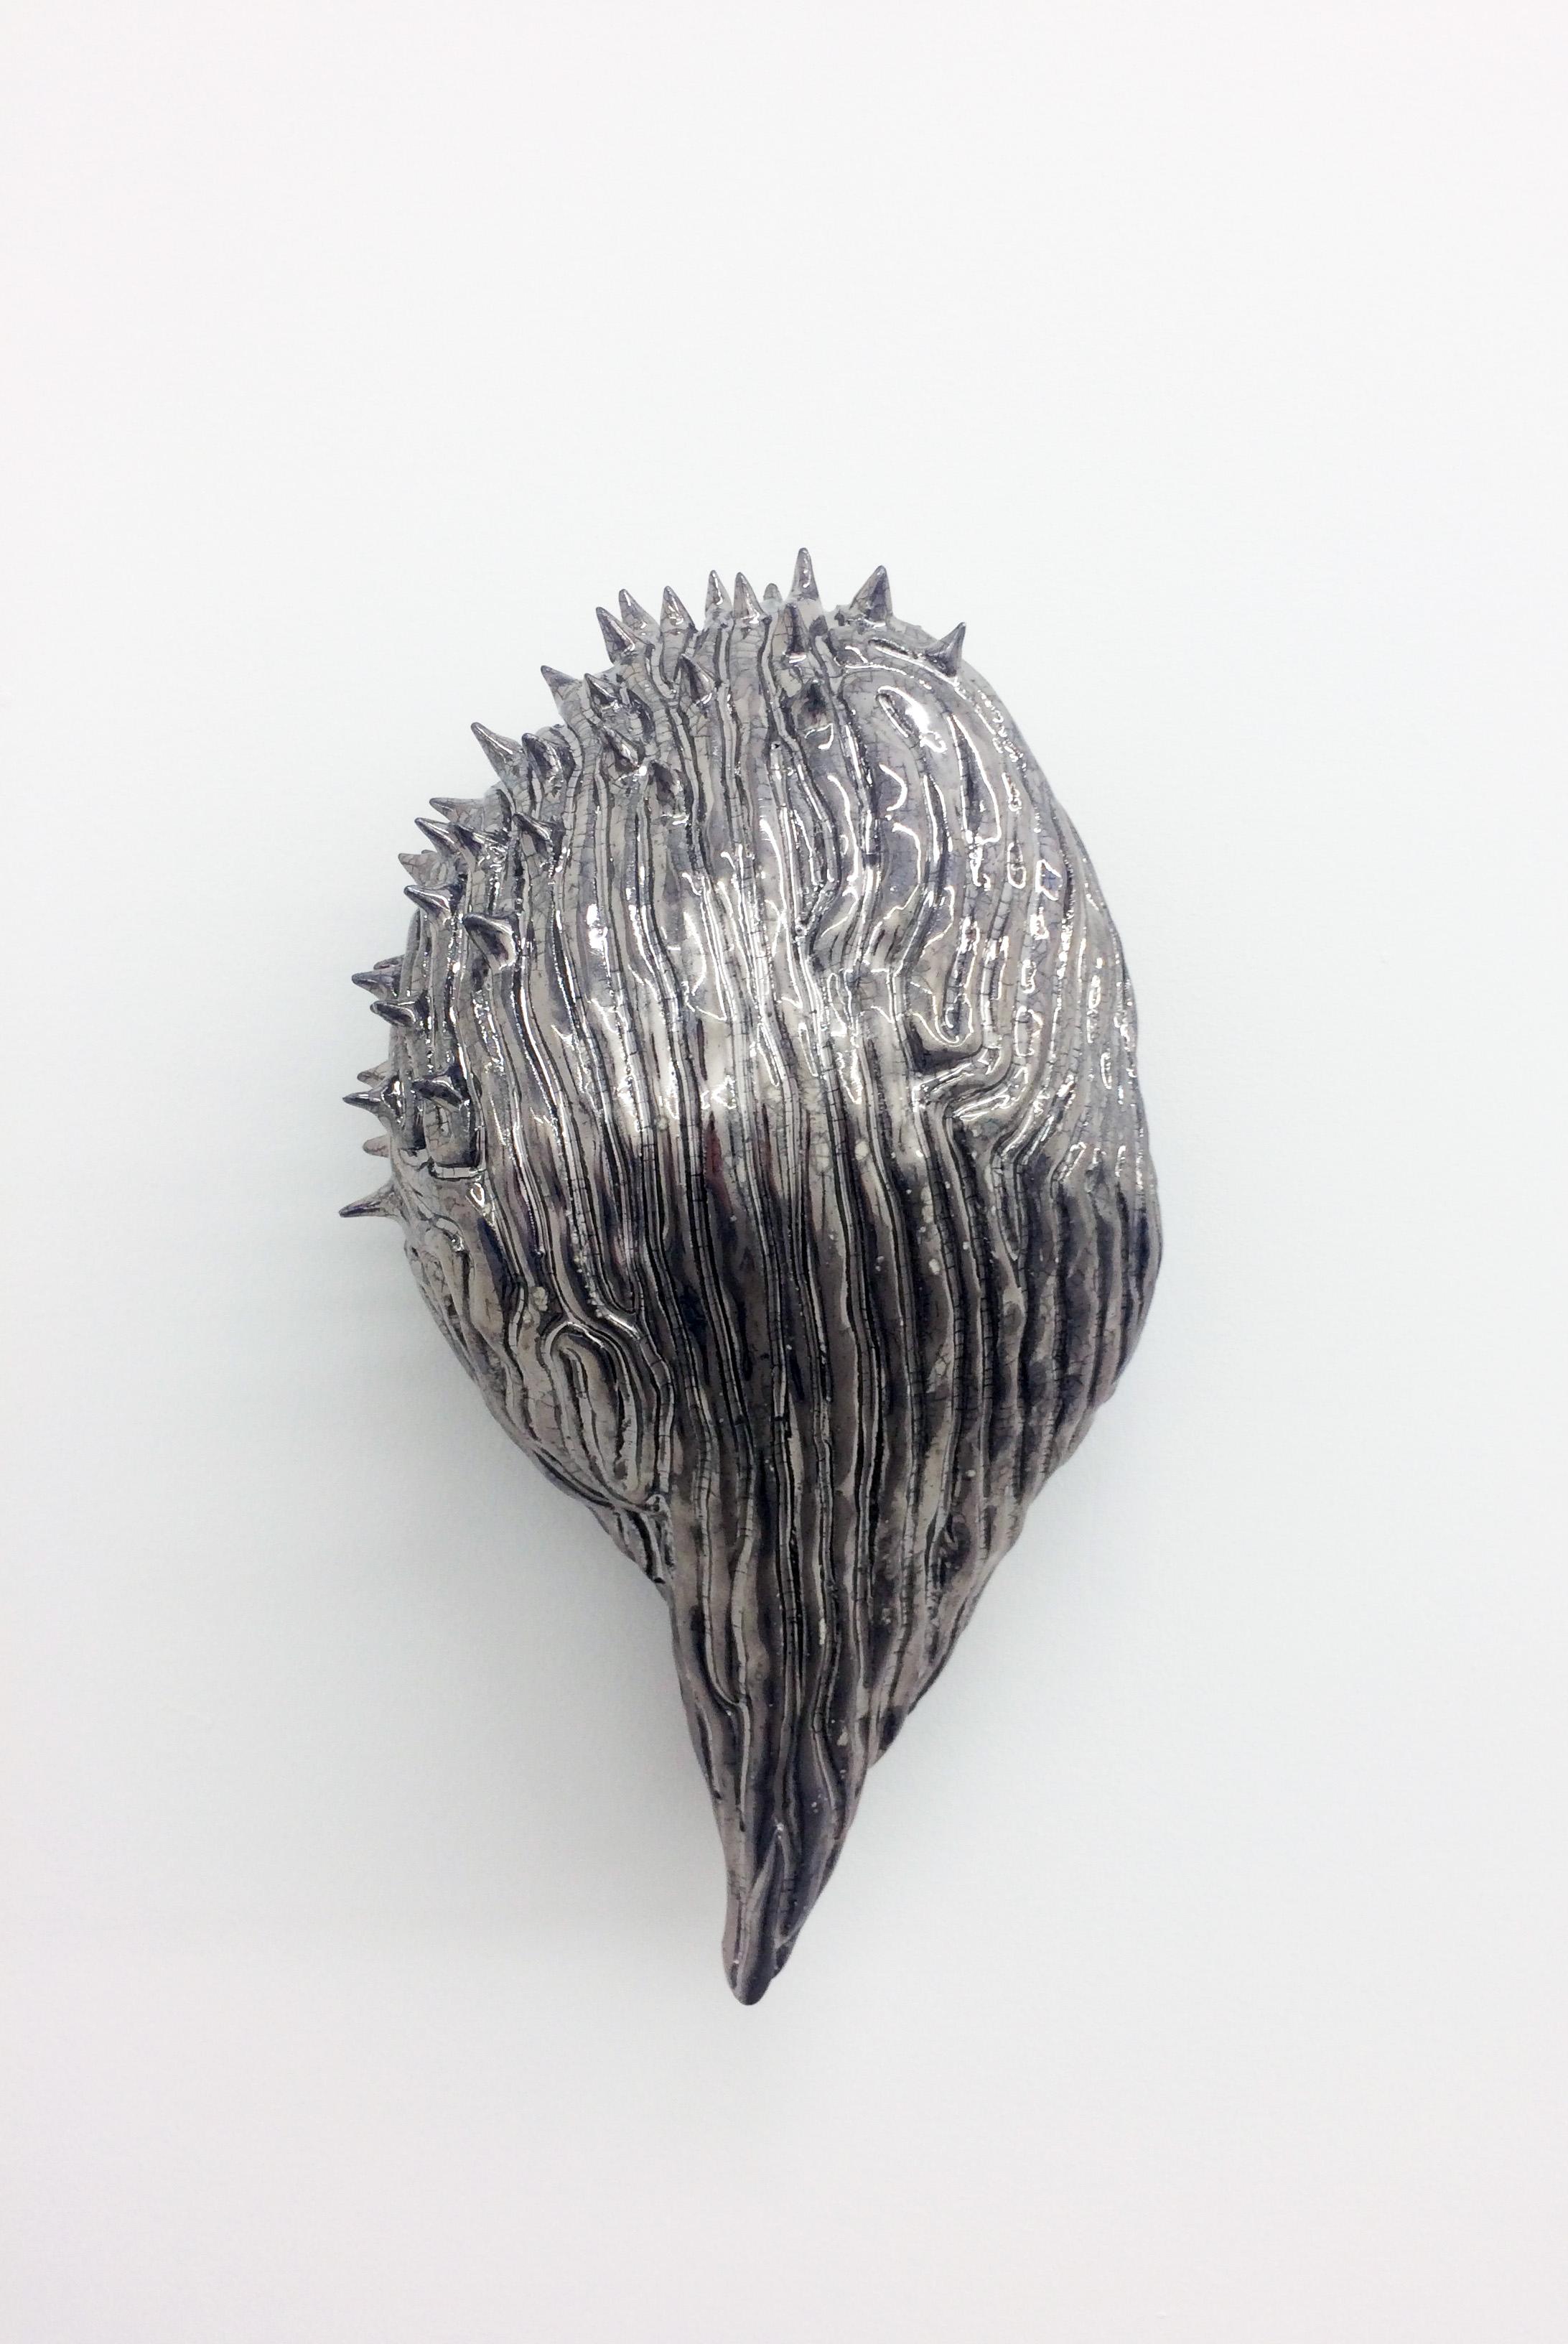 "Philippe Caron-Lefebvre,  Chrome Therapy , 2017, ceramic, glaze, gold and white gloss, 12.5"" x 7"" x 5"" (32 x 18 x 12 cm)"